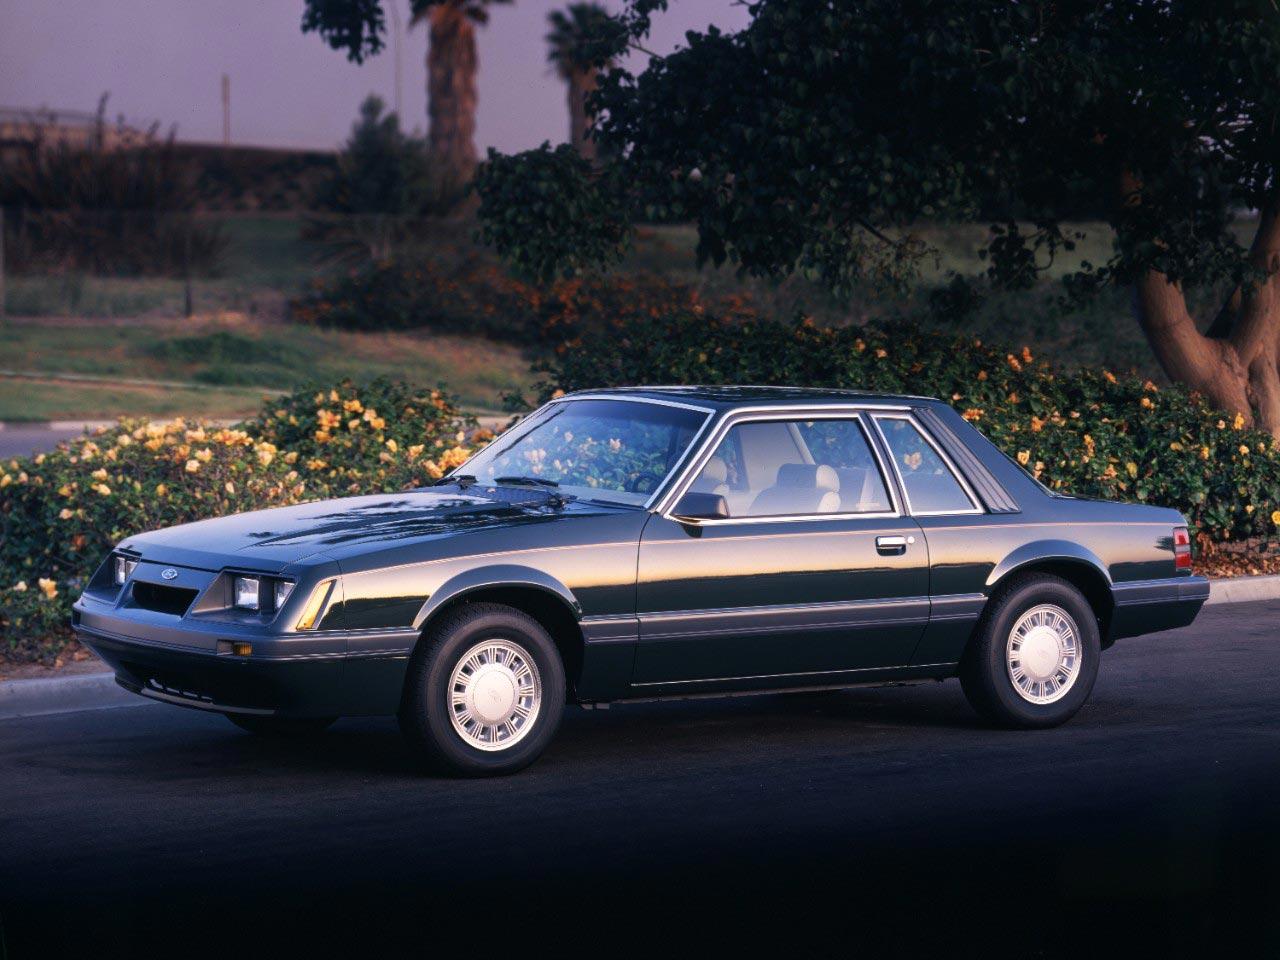 Mustang LX (1984)